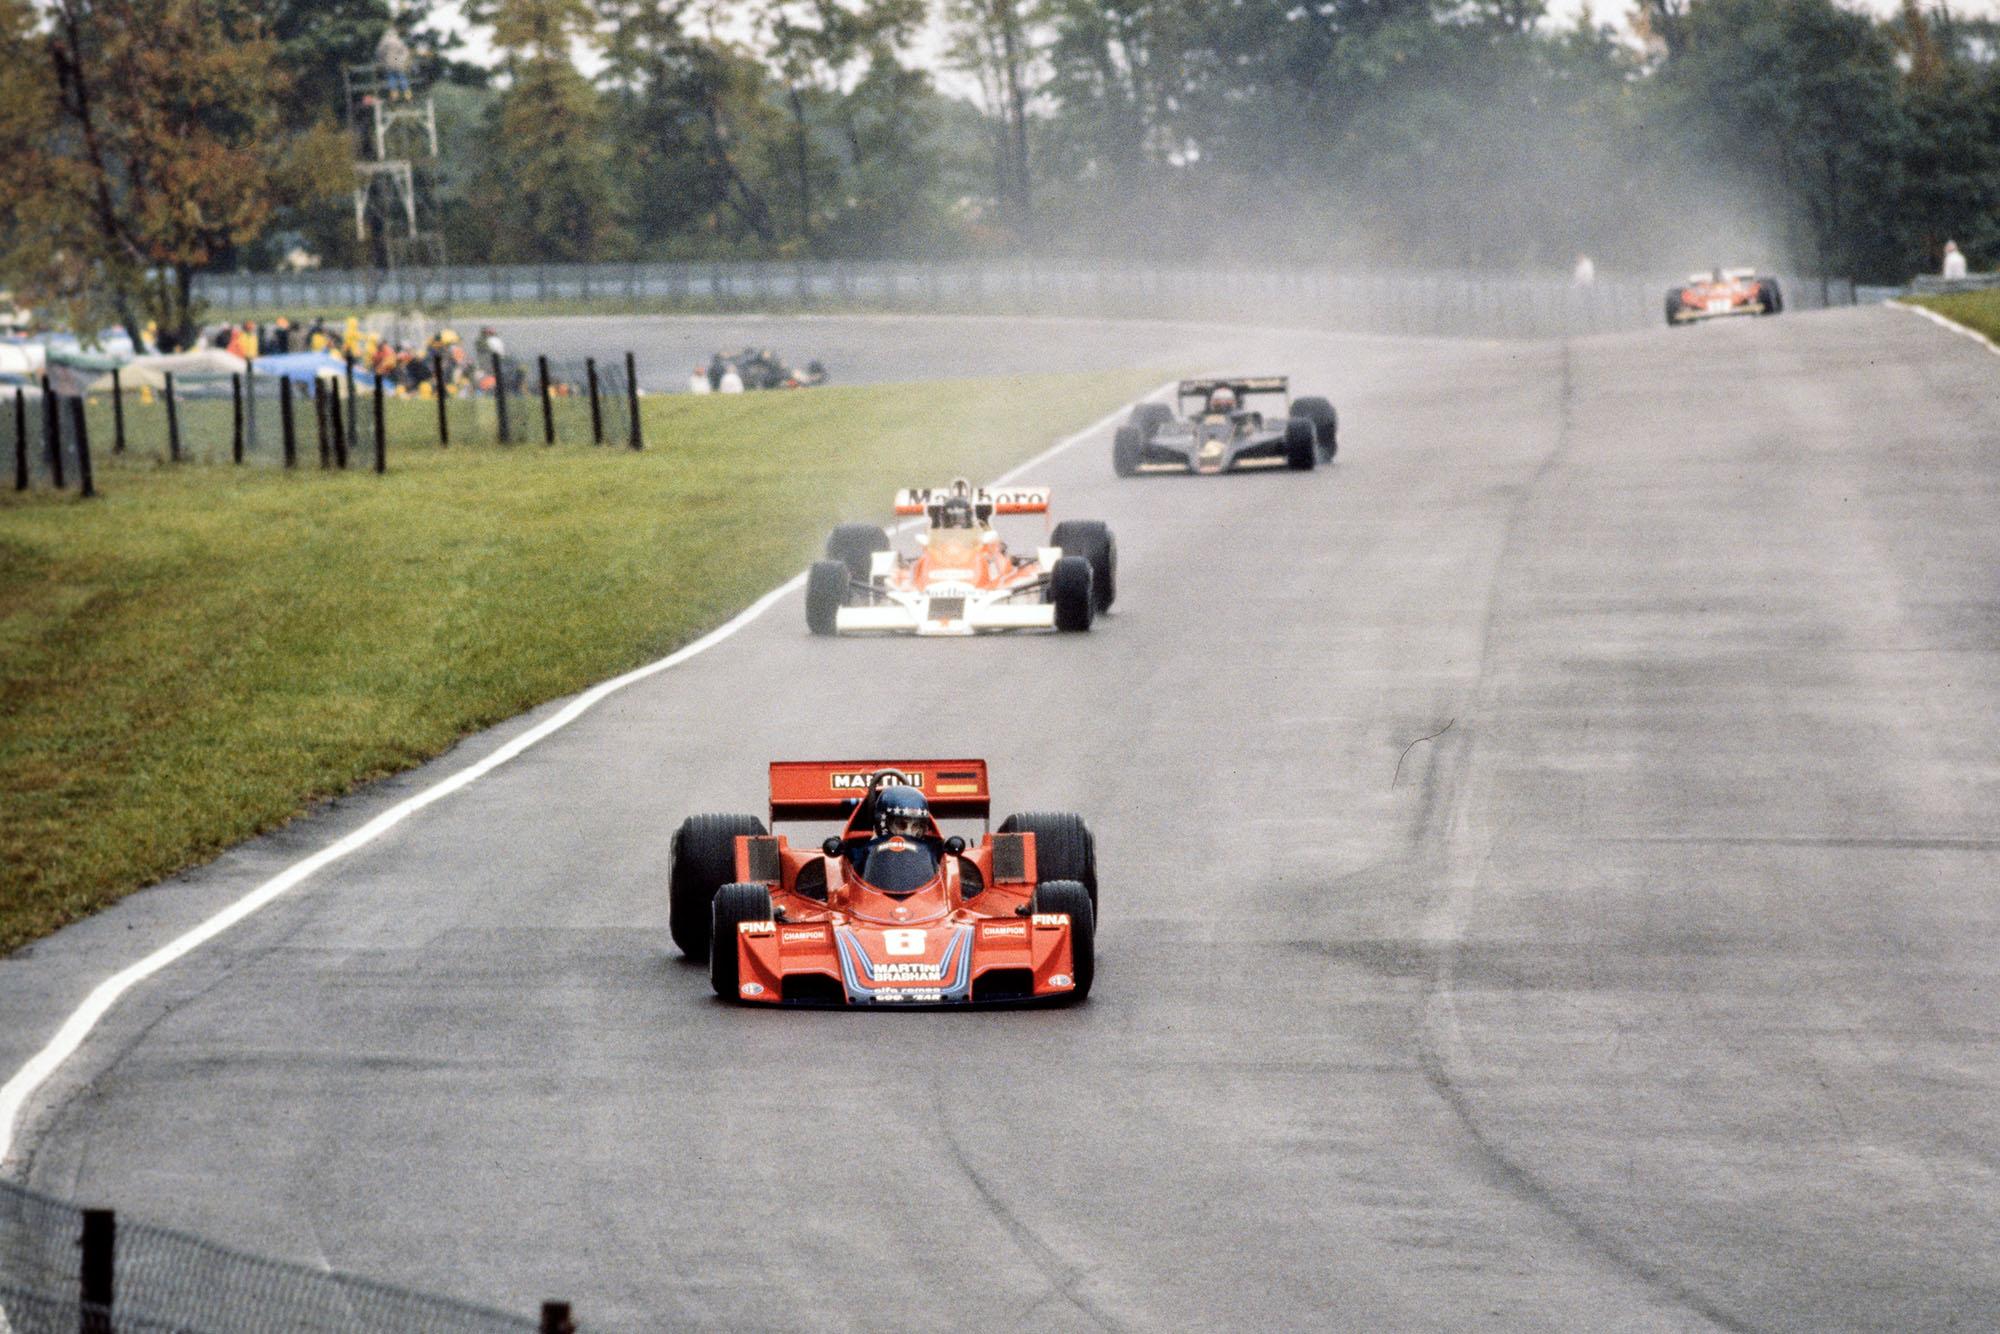 Hans-Joachim Stuck leads at the start of the 1977 United States Grand Prix East, Watkins Glen.